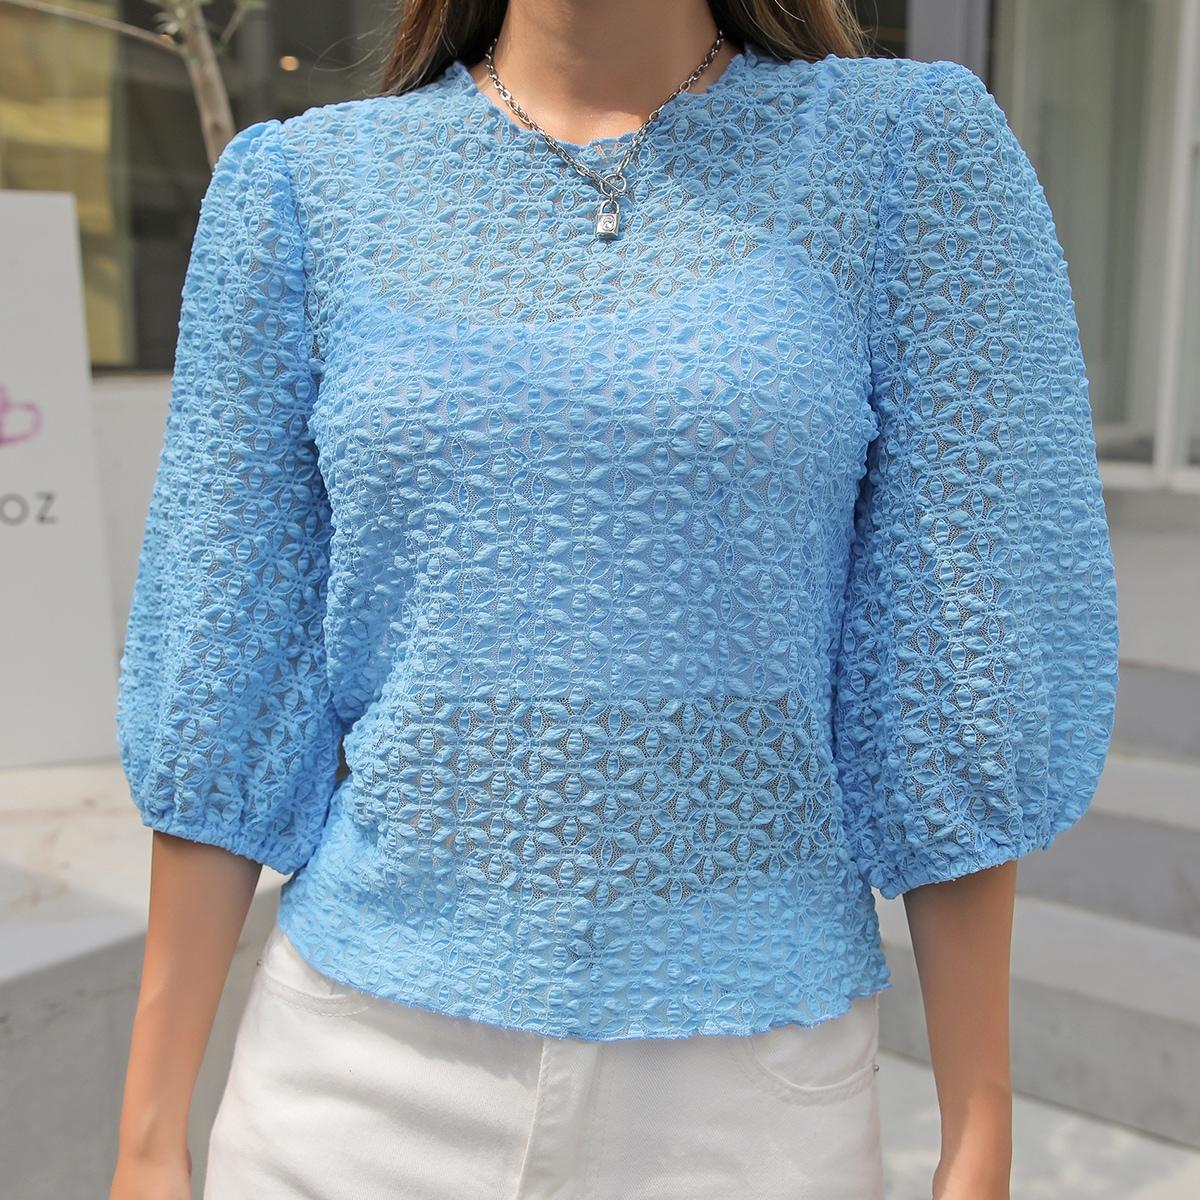 Блуза из гипюра с цветочным рисунком SheIn swblouse30210618880